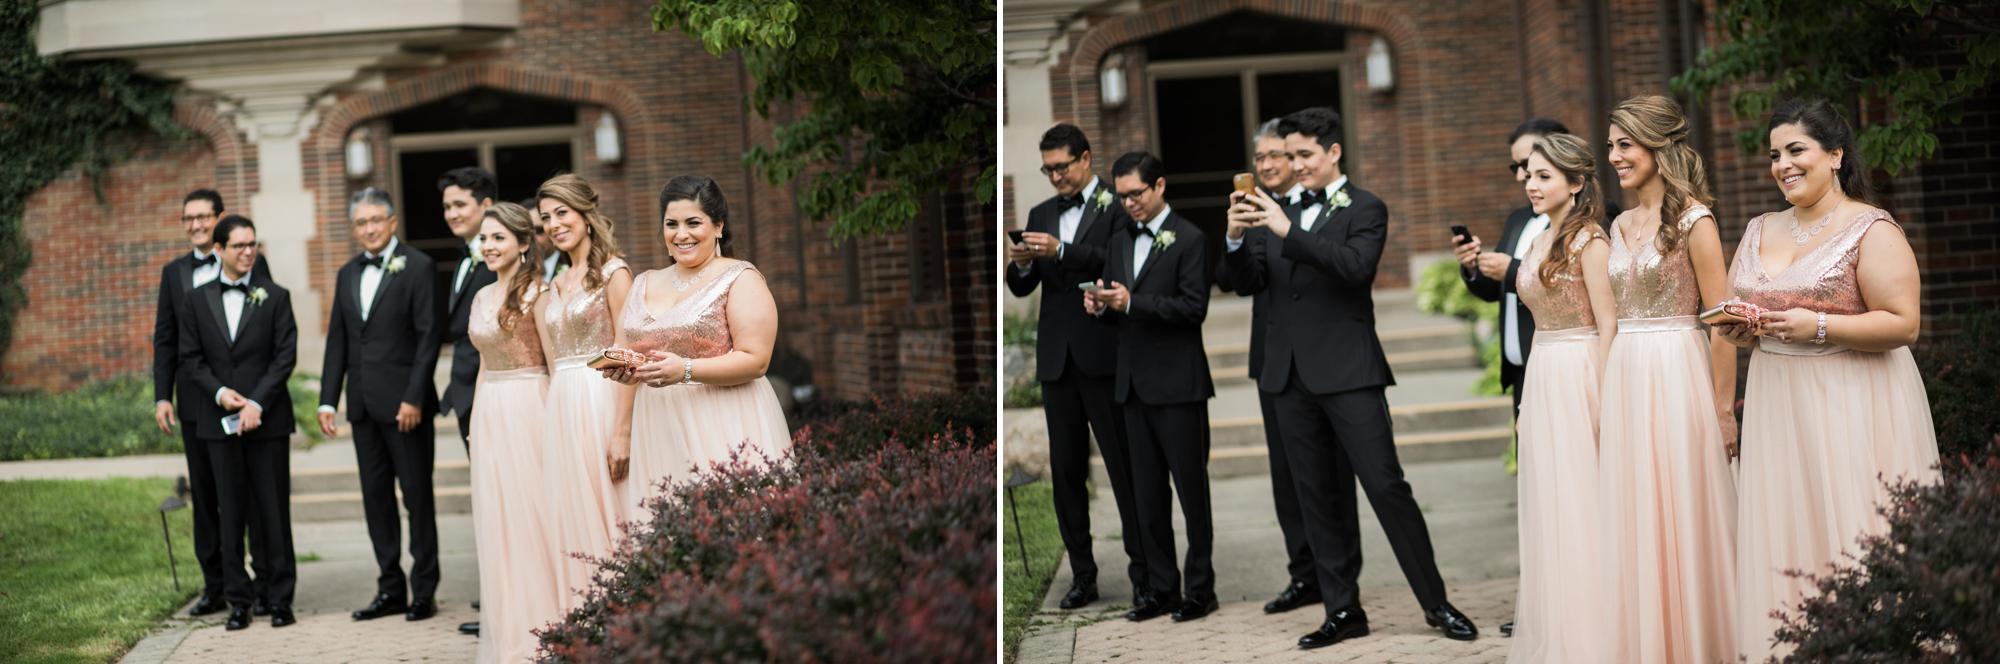 sylvania-country-club-wedding-photos-210.jpg